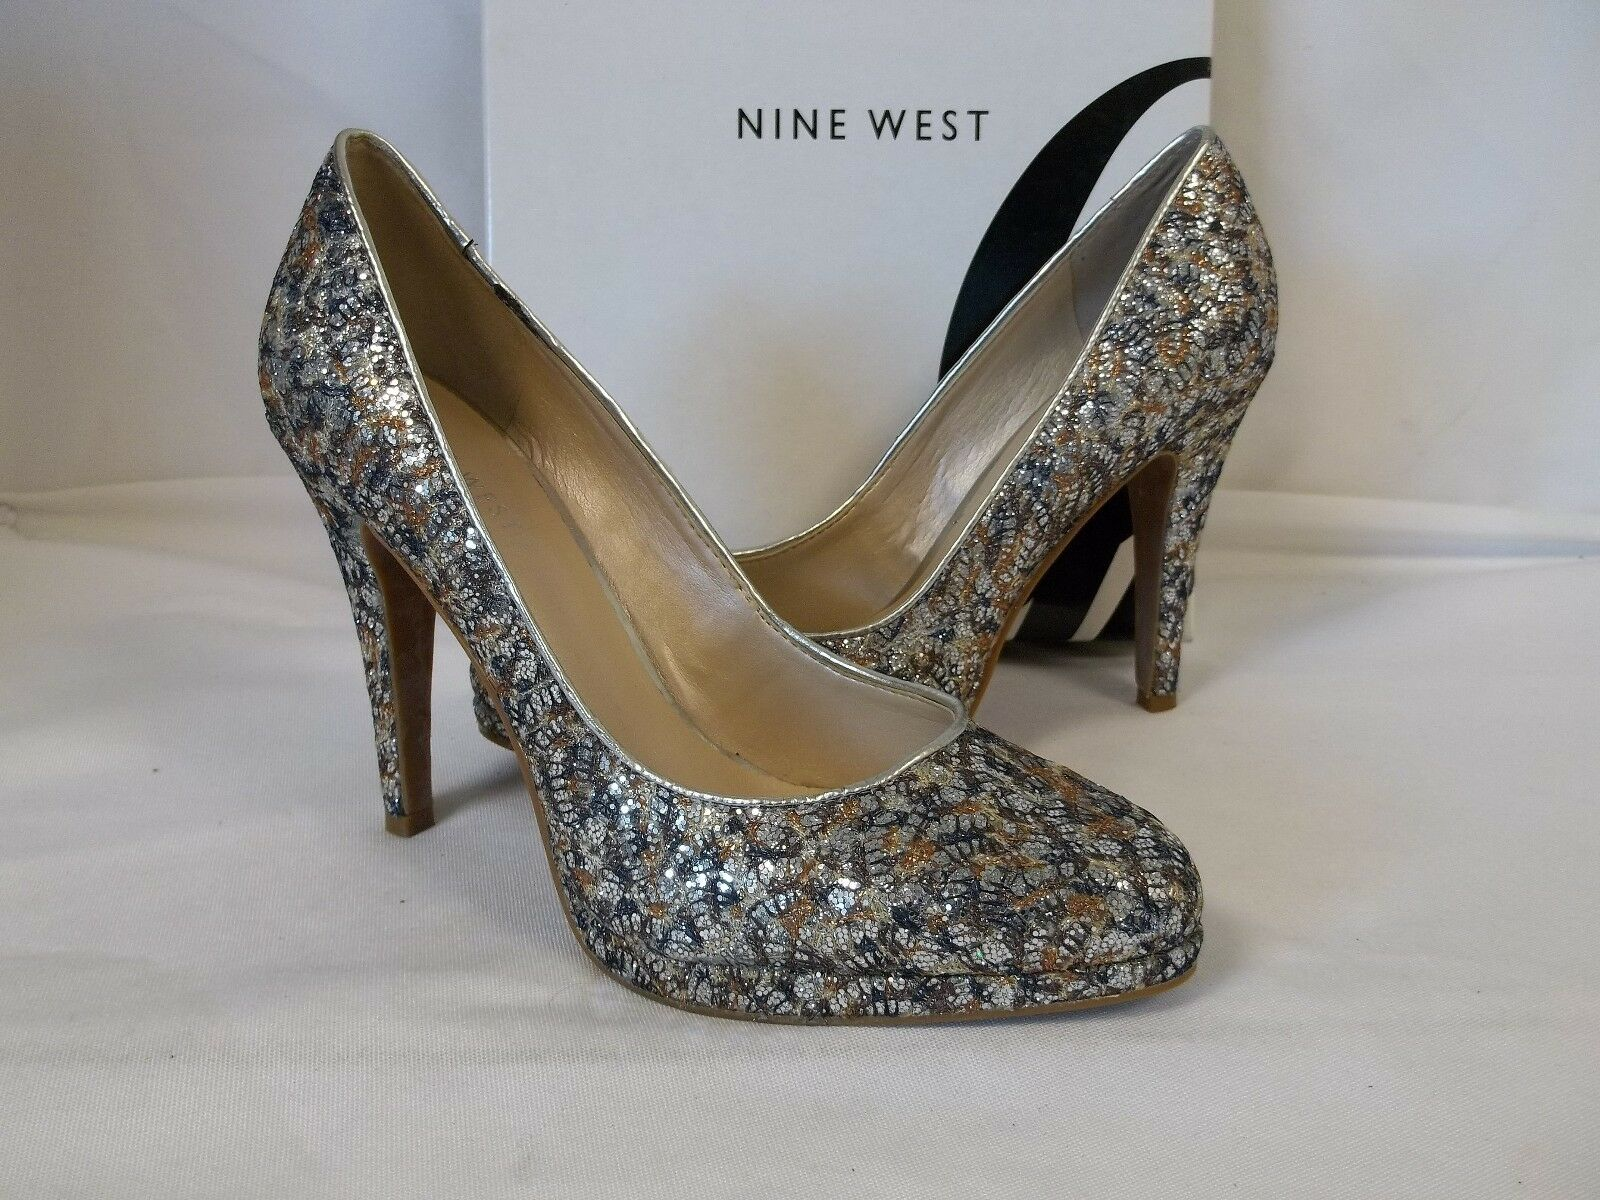 Nine West 7.5 M Rocha Silver Multi Farbe Heels NEU Damenschuhe Schuhes